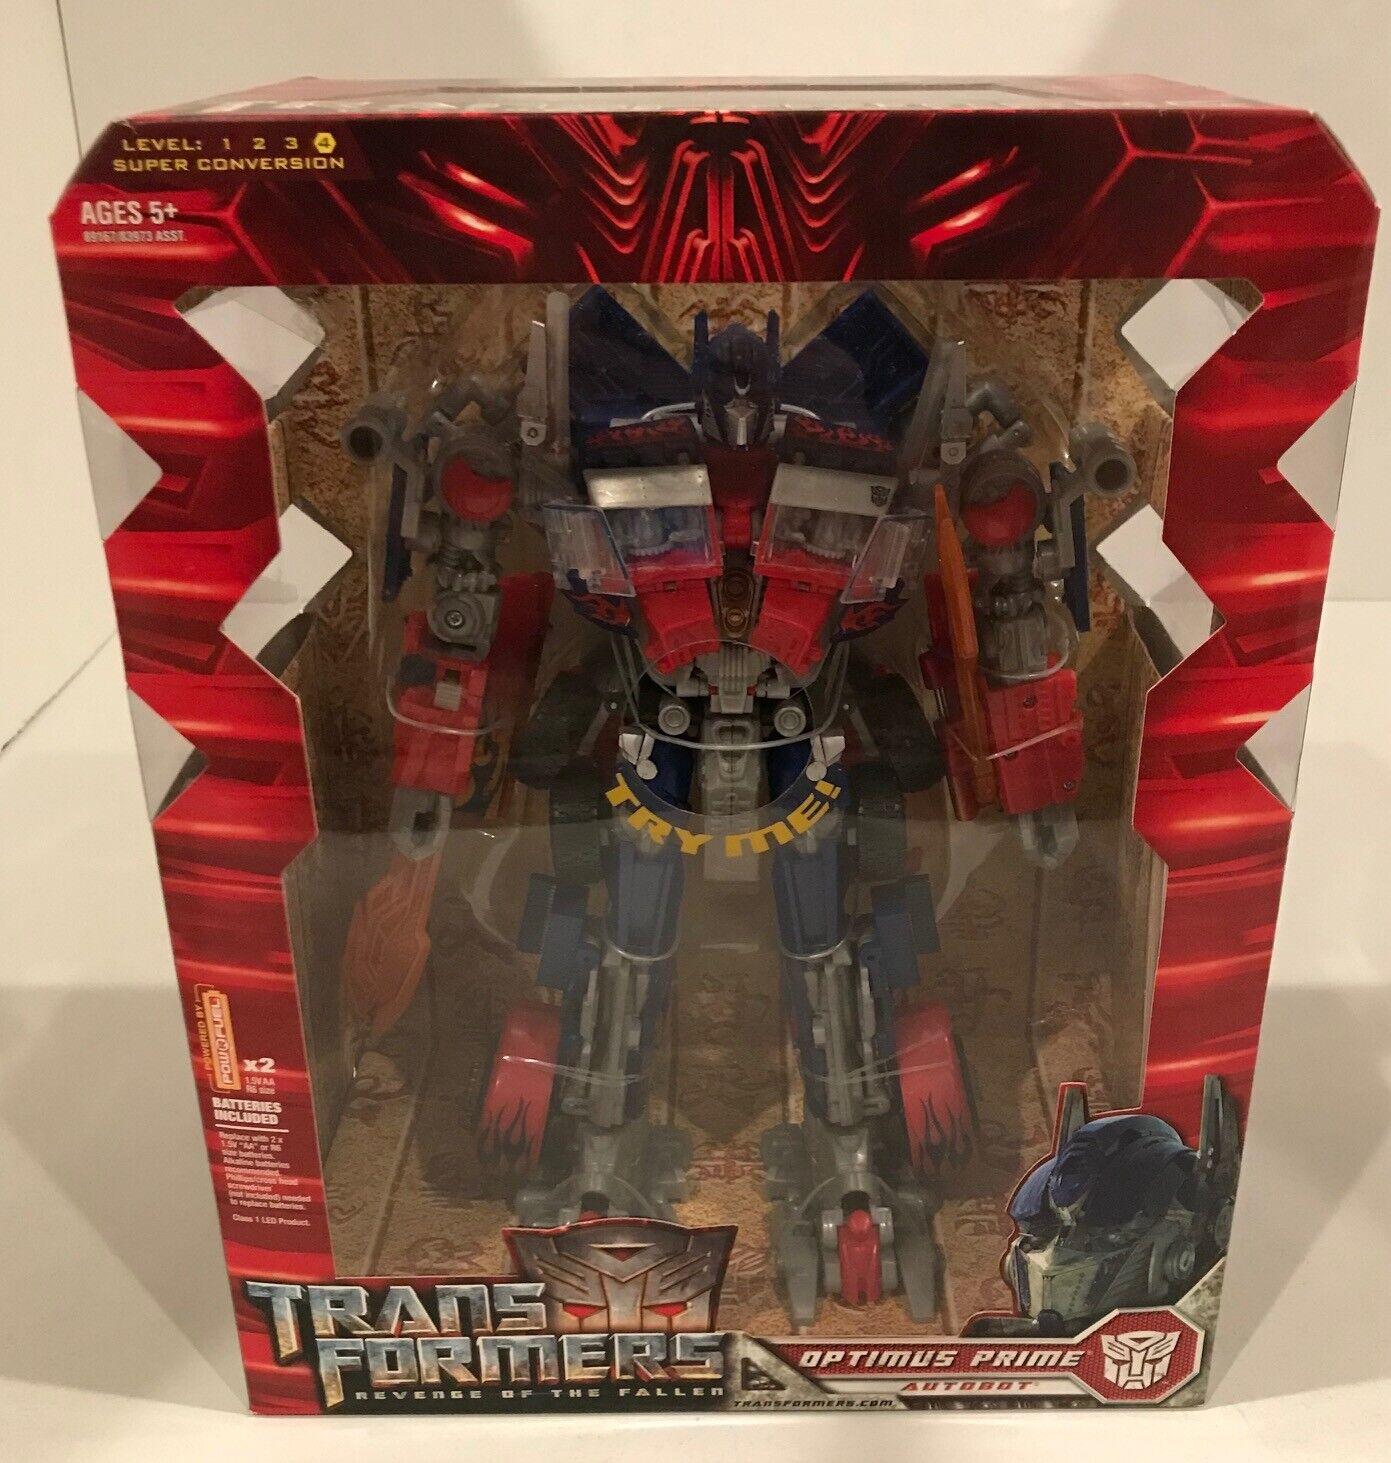 2008 Hasbro Transformers Revenge of the Fallen Leader Optimus Prime Autobot Comme neuf IN BOX